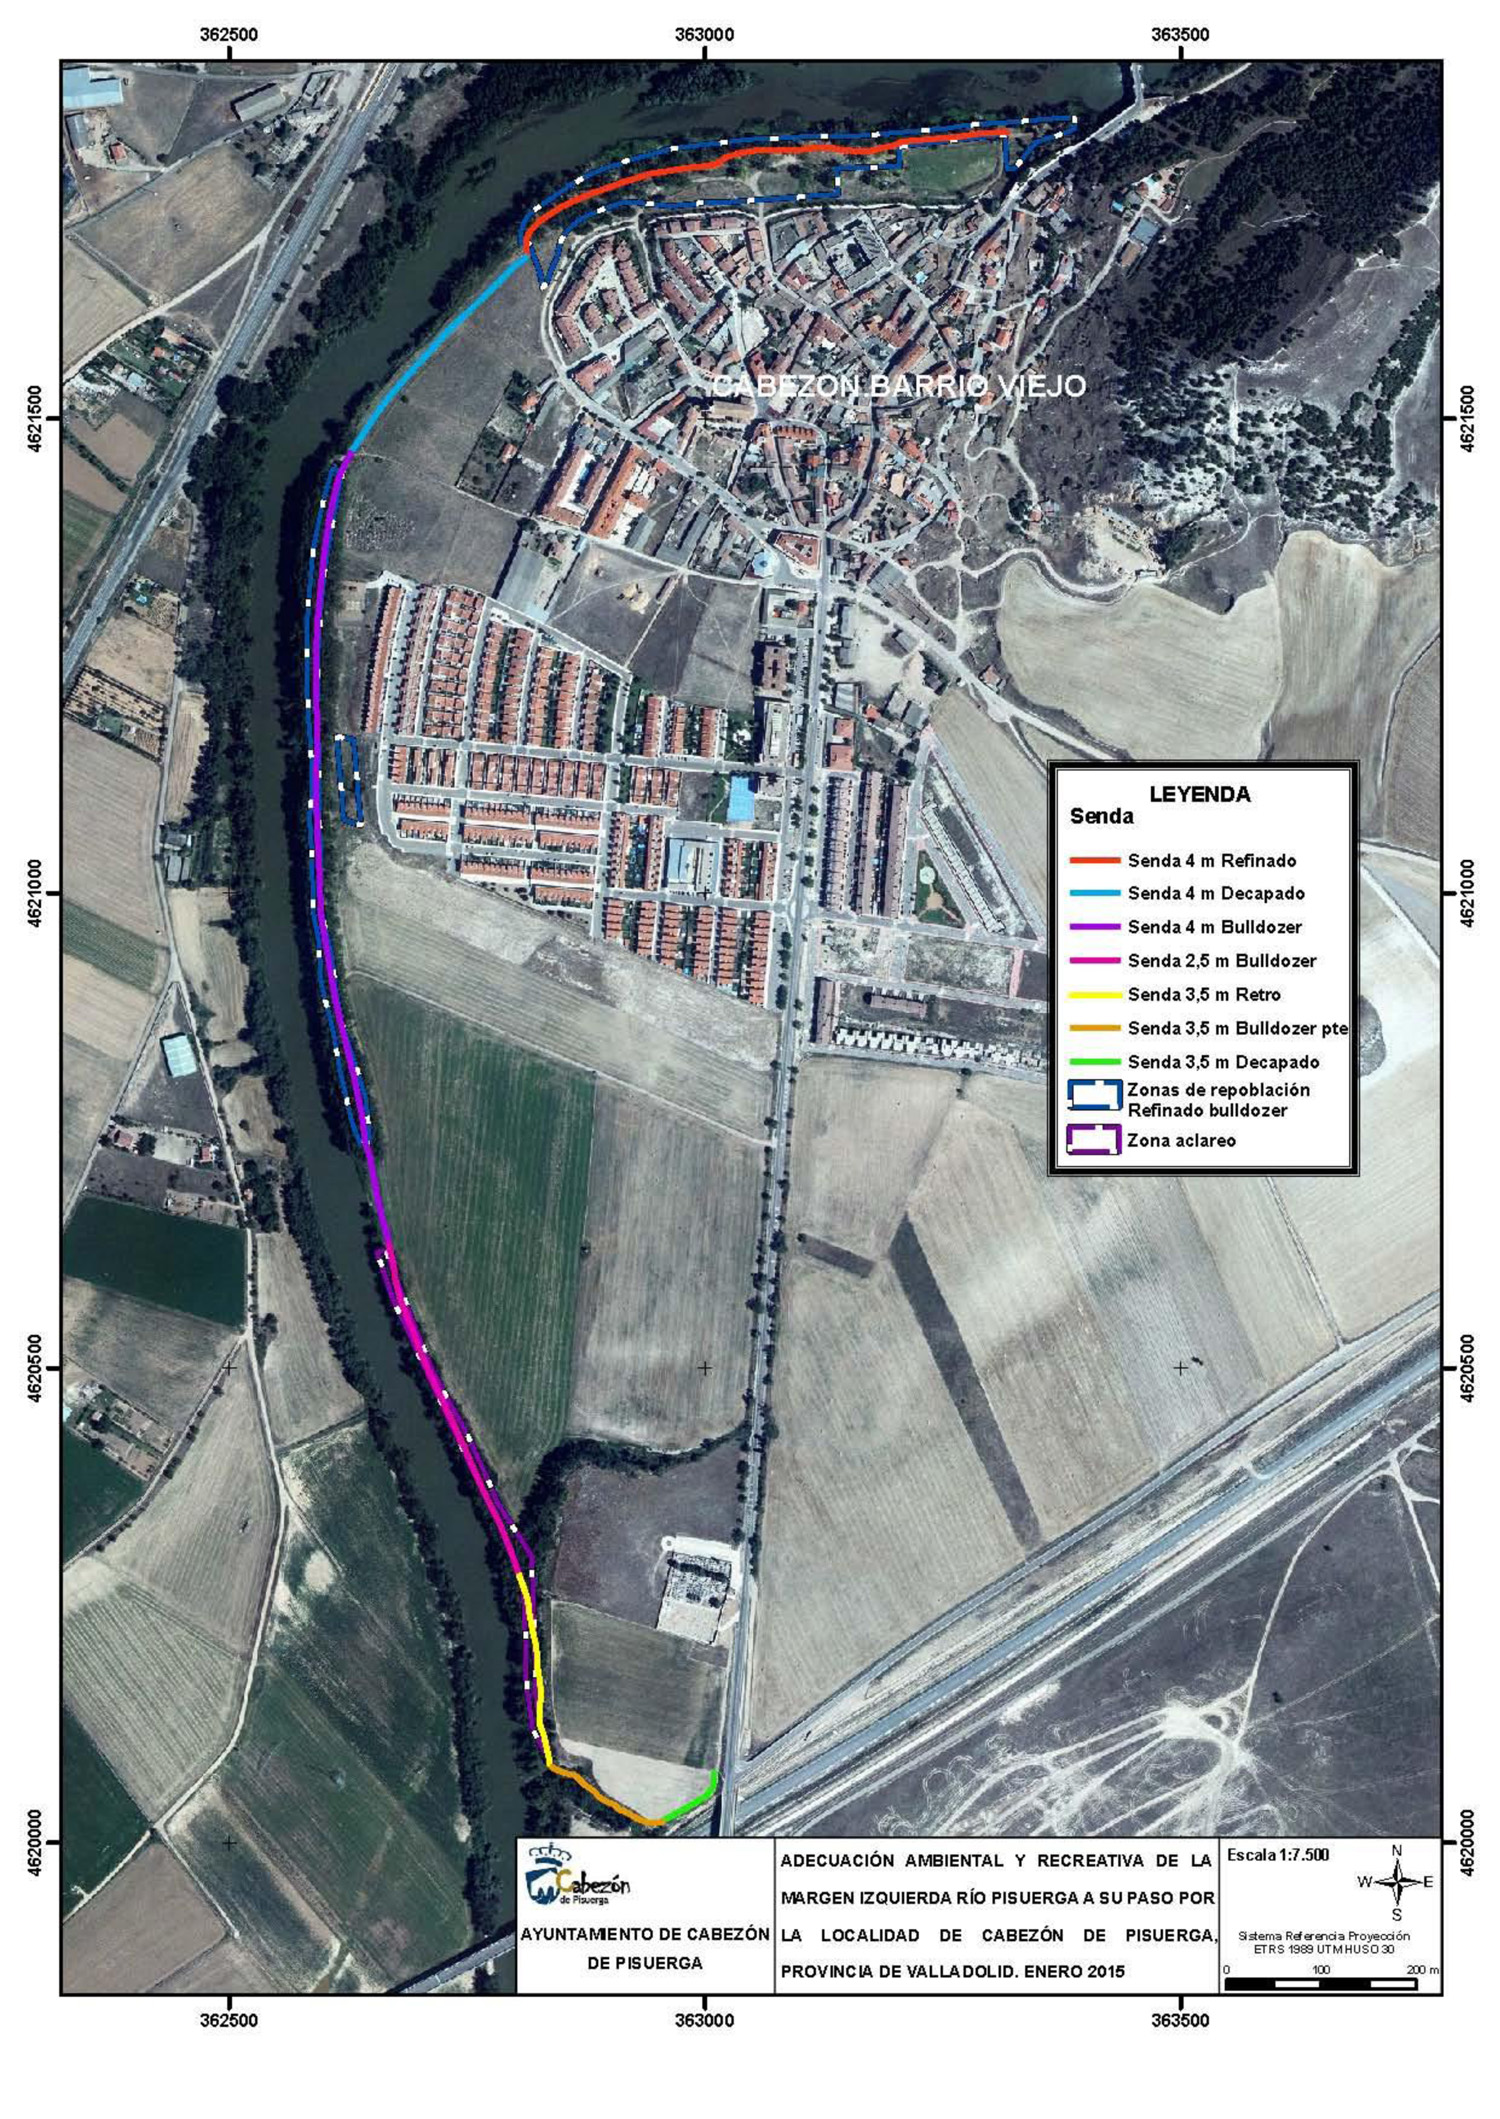 Circuito Ribera : Cuarta prueba del circuito diario de navarra ribera navarra